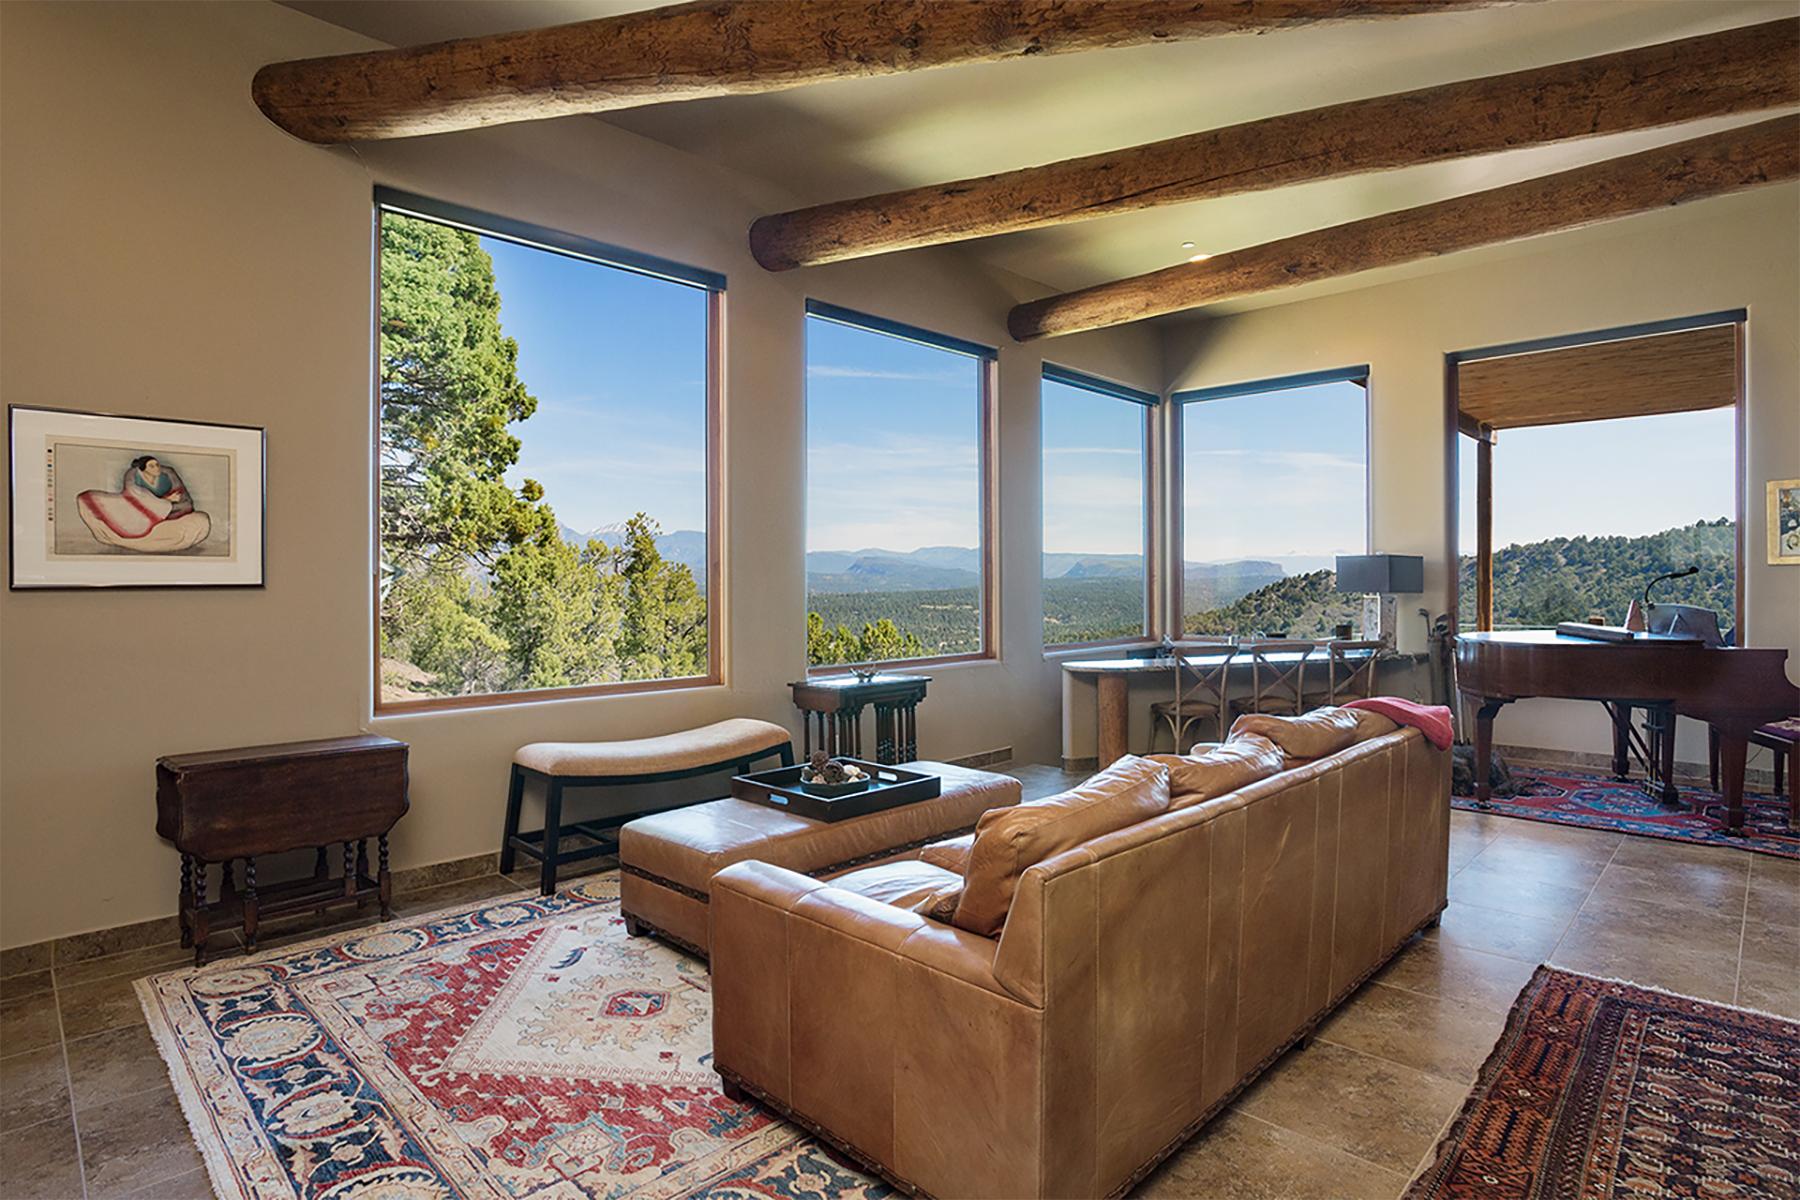 Additional photo for property listing at 1463 Thunderbird Road 1463 Thunderbird Road Durango, Colorado 81301 United States